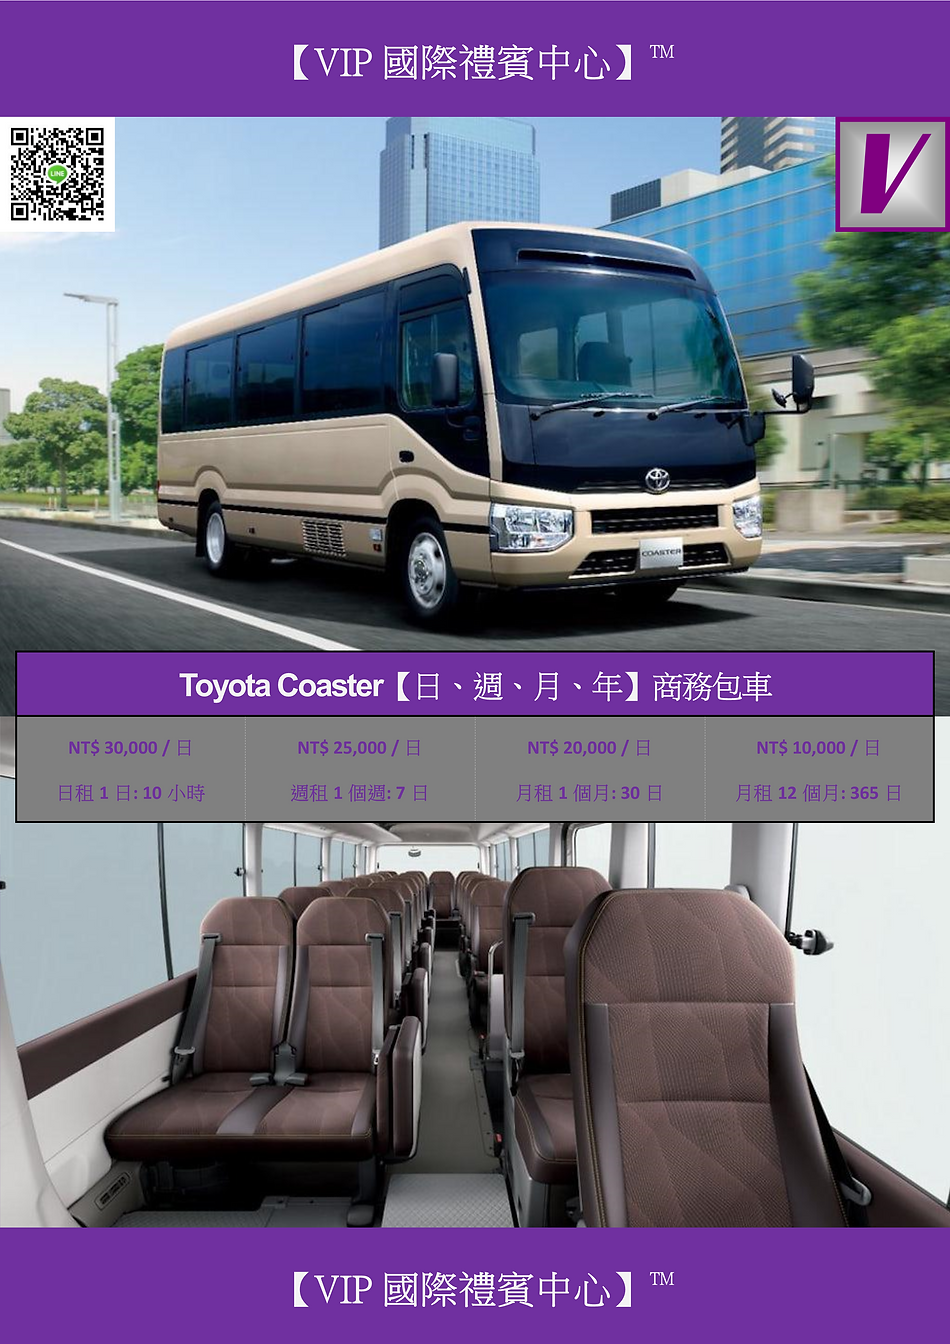 VIP國際禮賓中心 TOYOTA COASTER DM.png